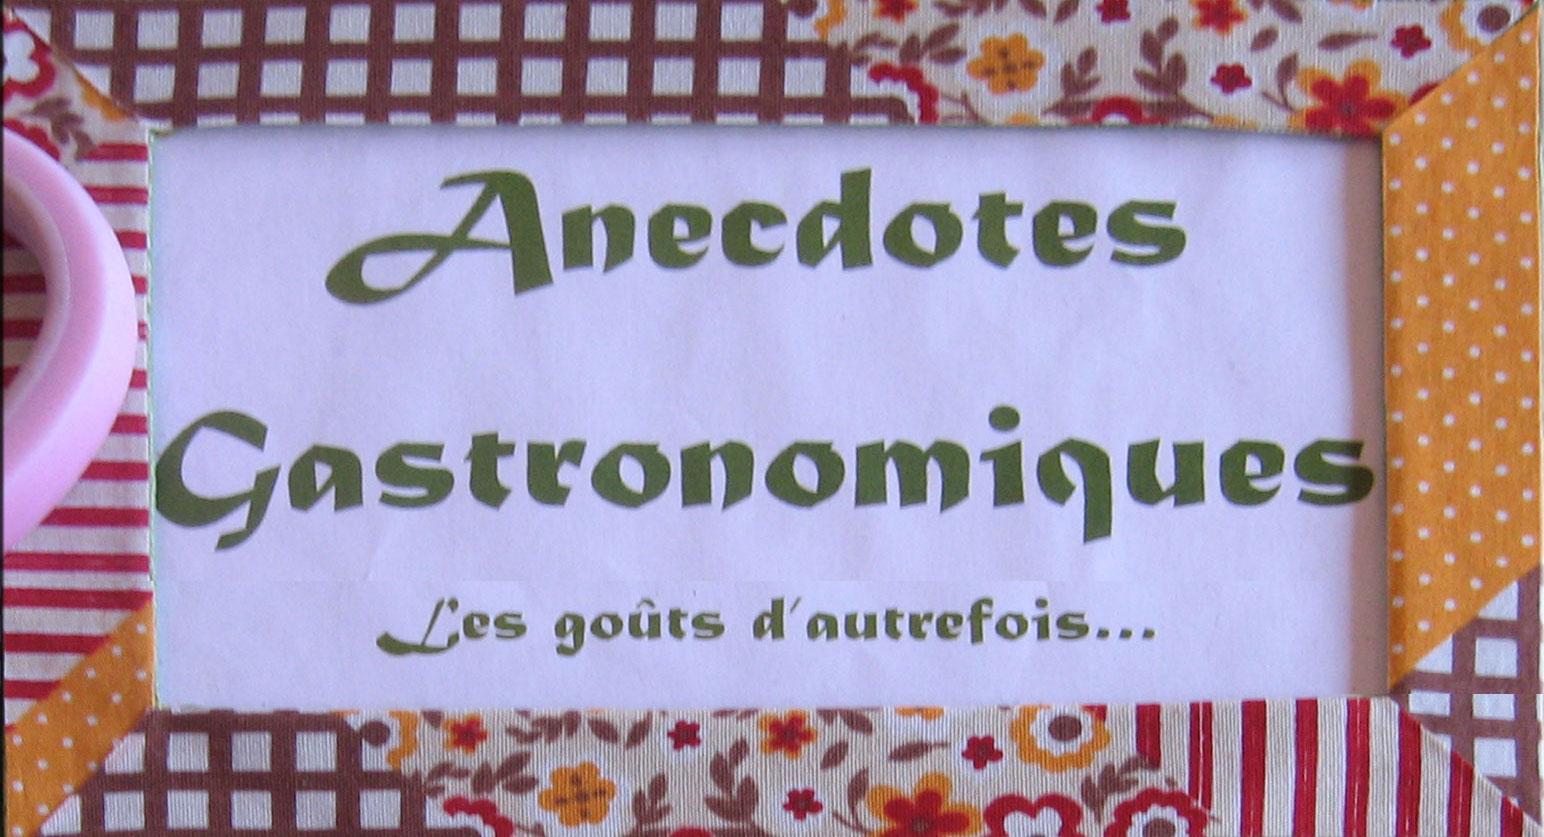 anecdotes gastronomiques